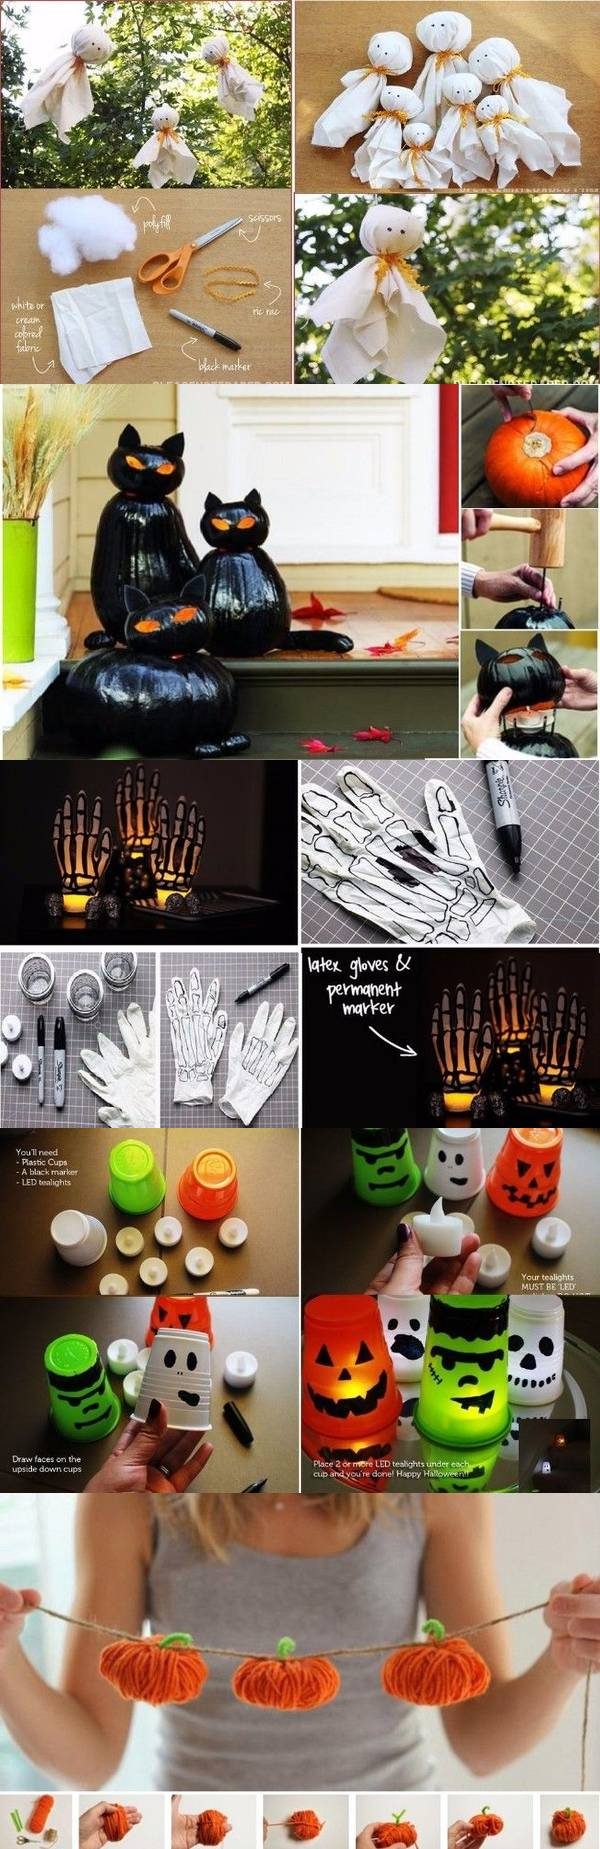 Декор дома на Хэллоуин – 26 вариантов